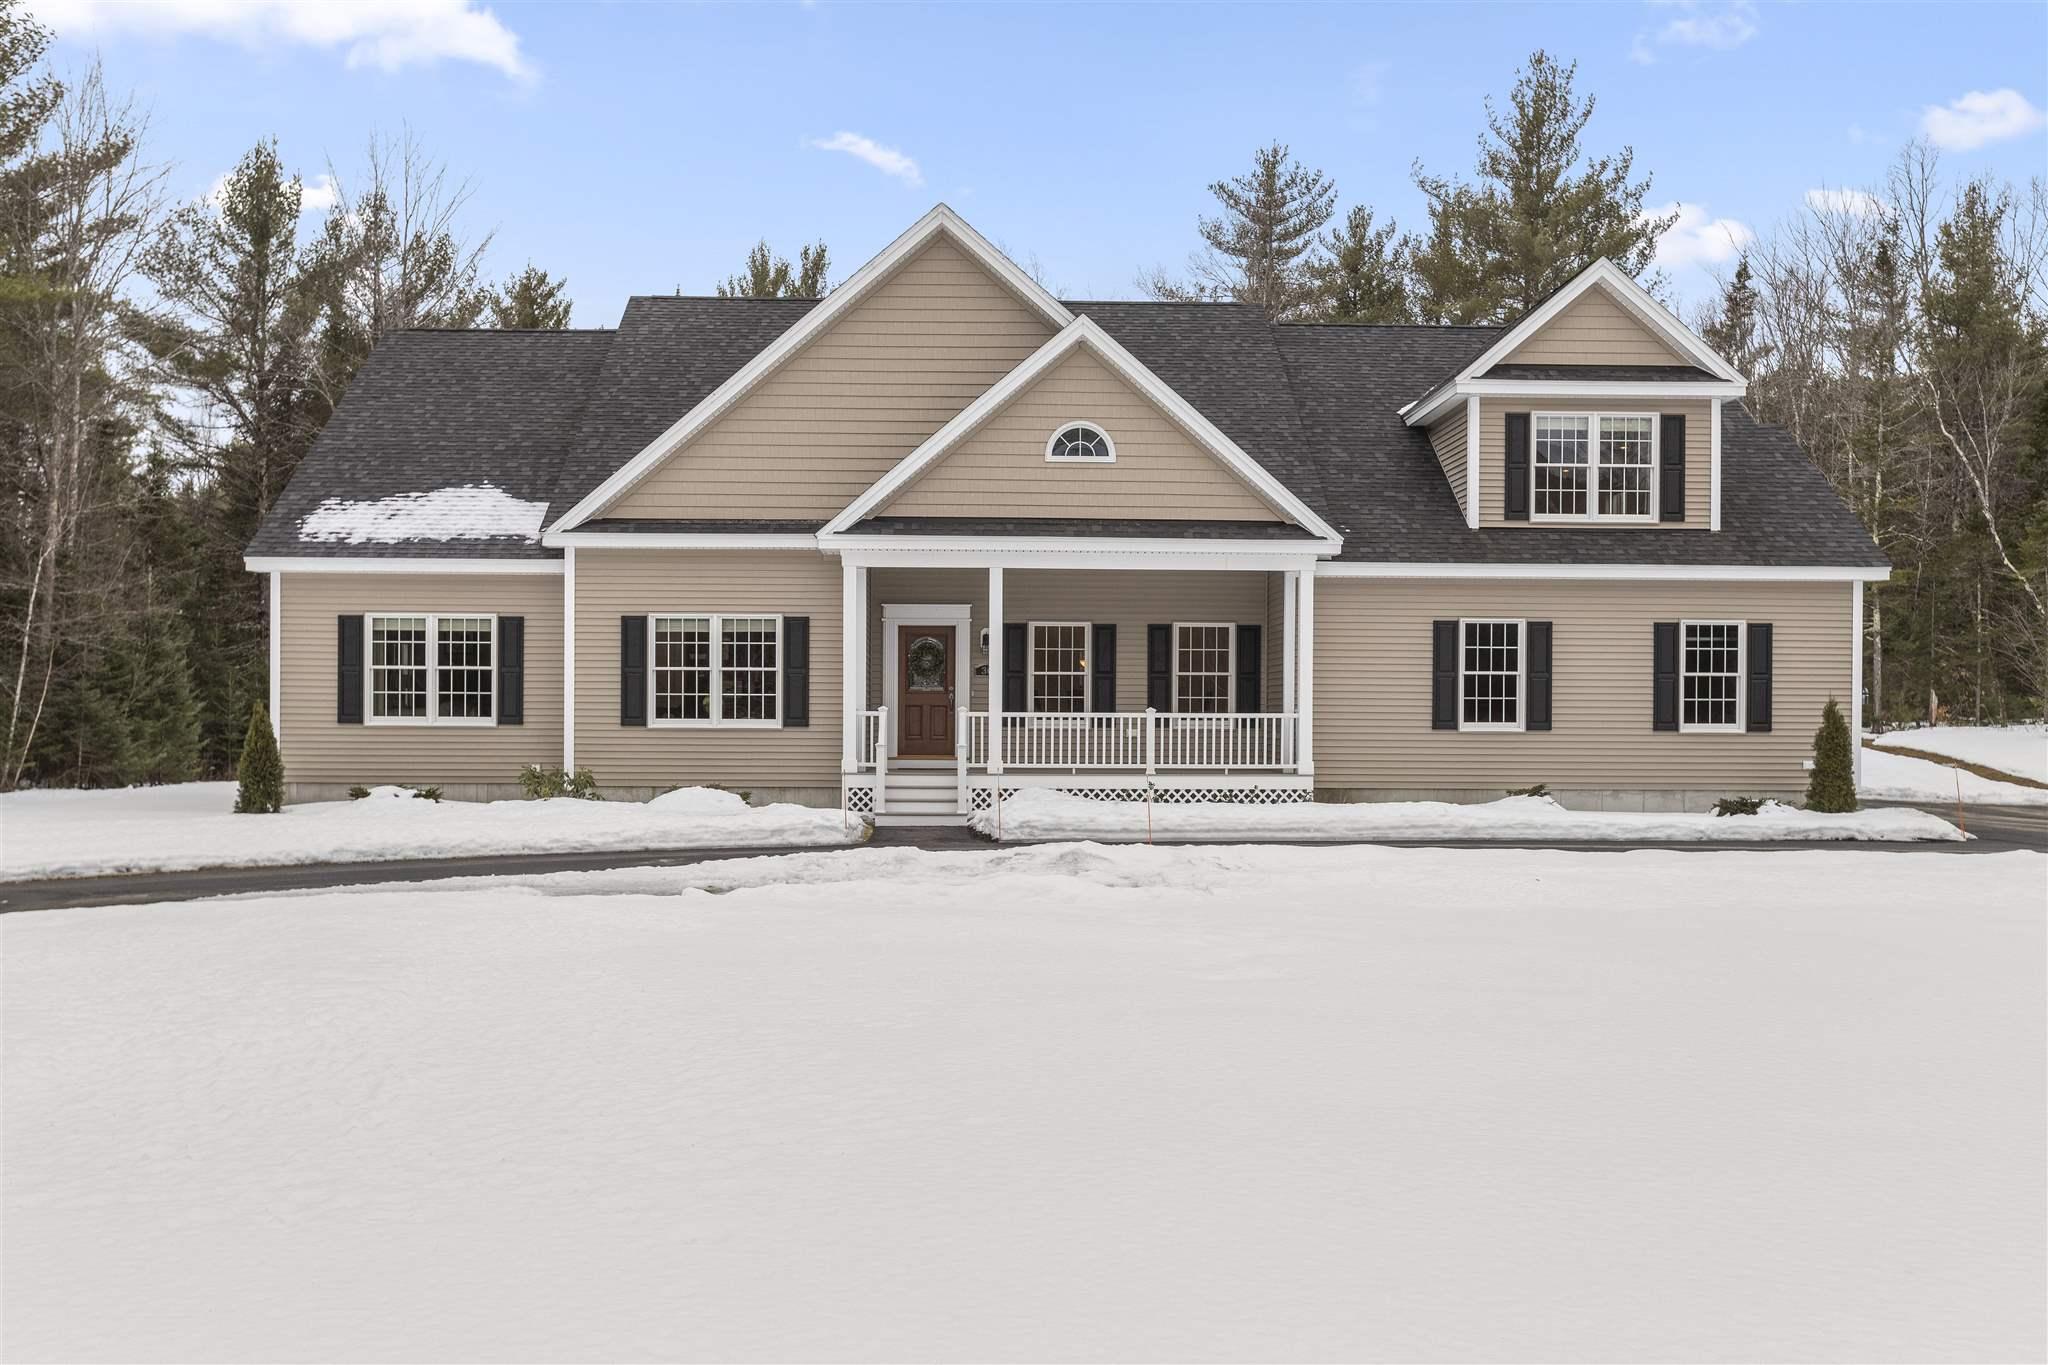 TUFTONBORO NH Home for sale $629,000